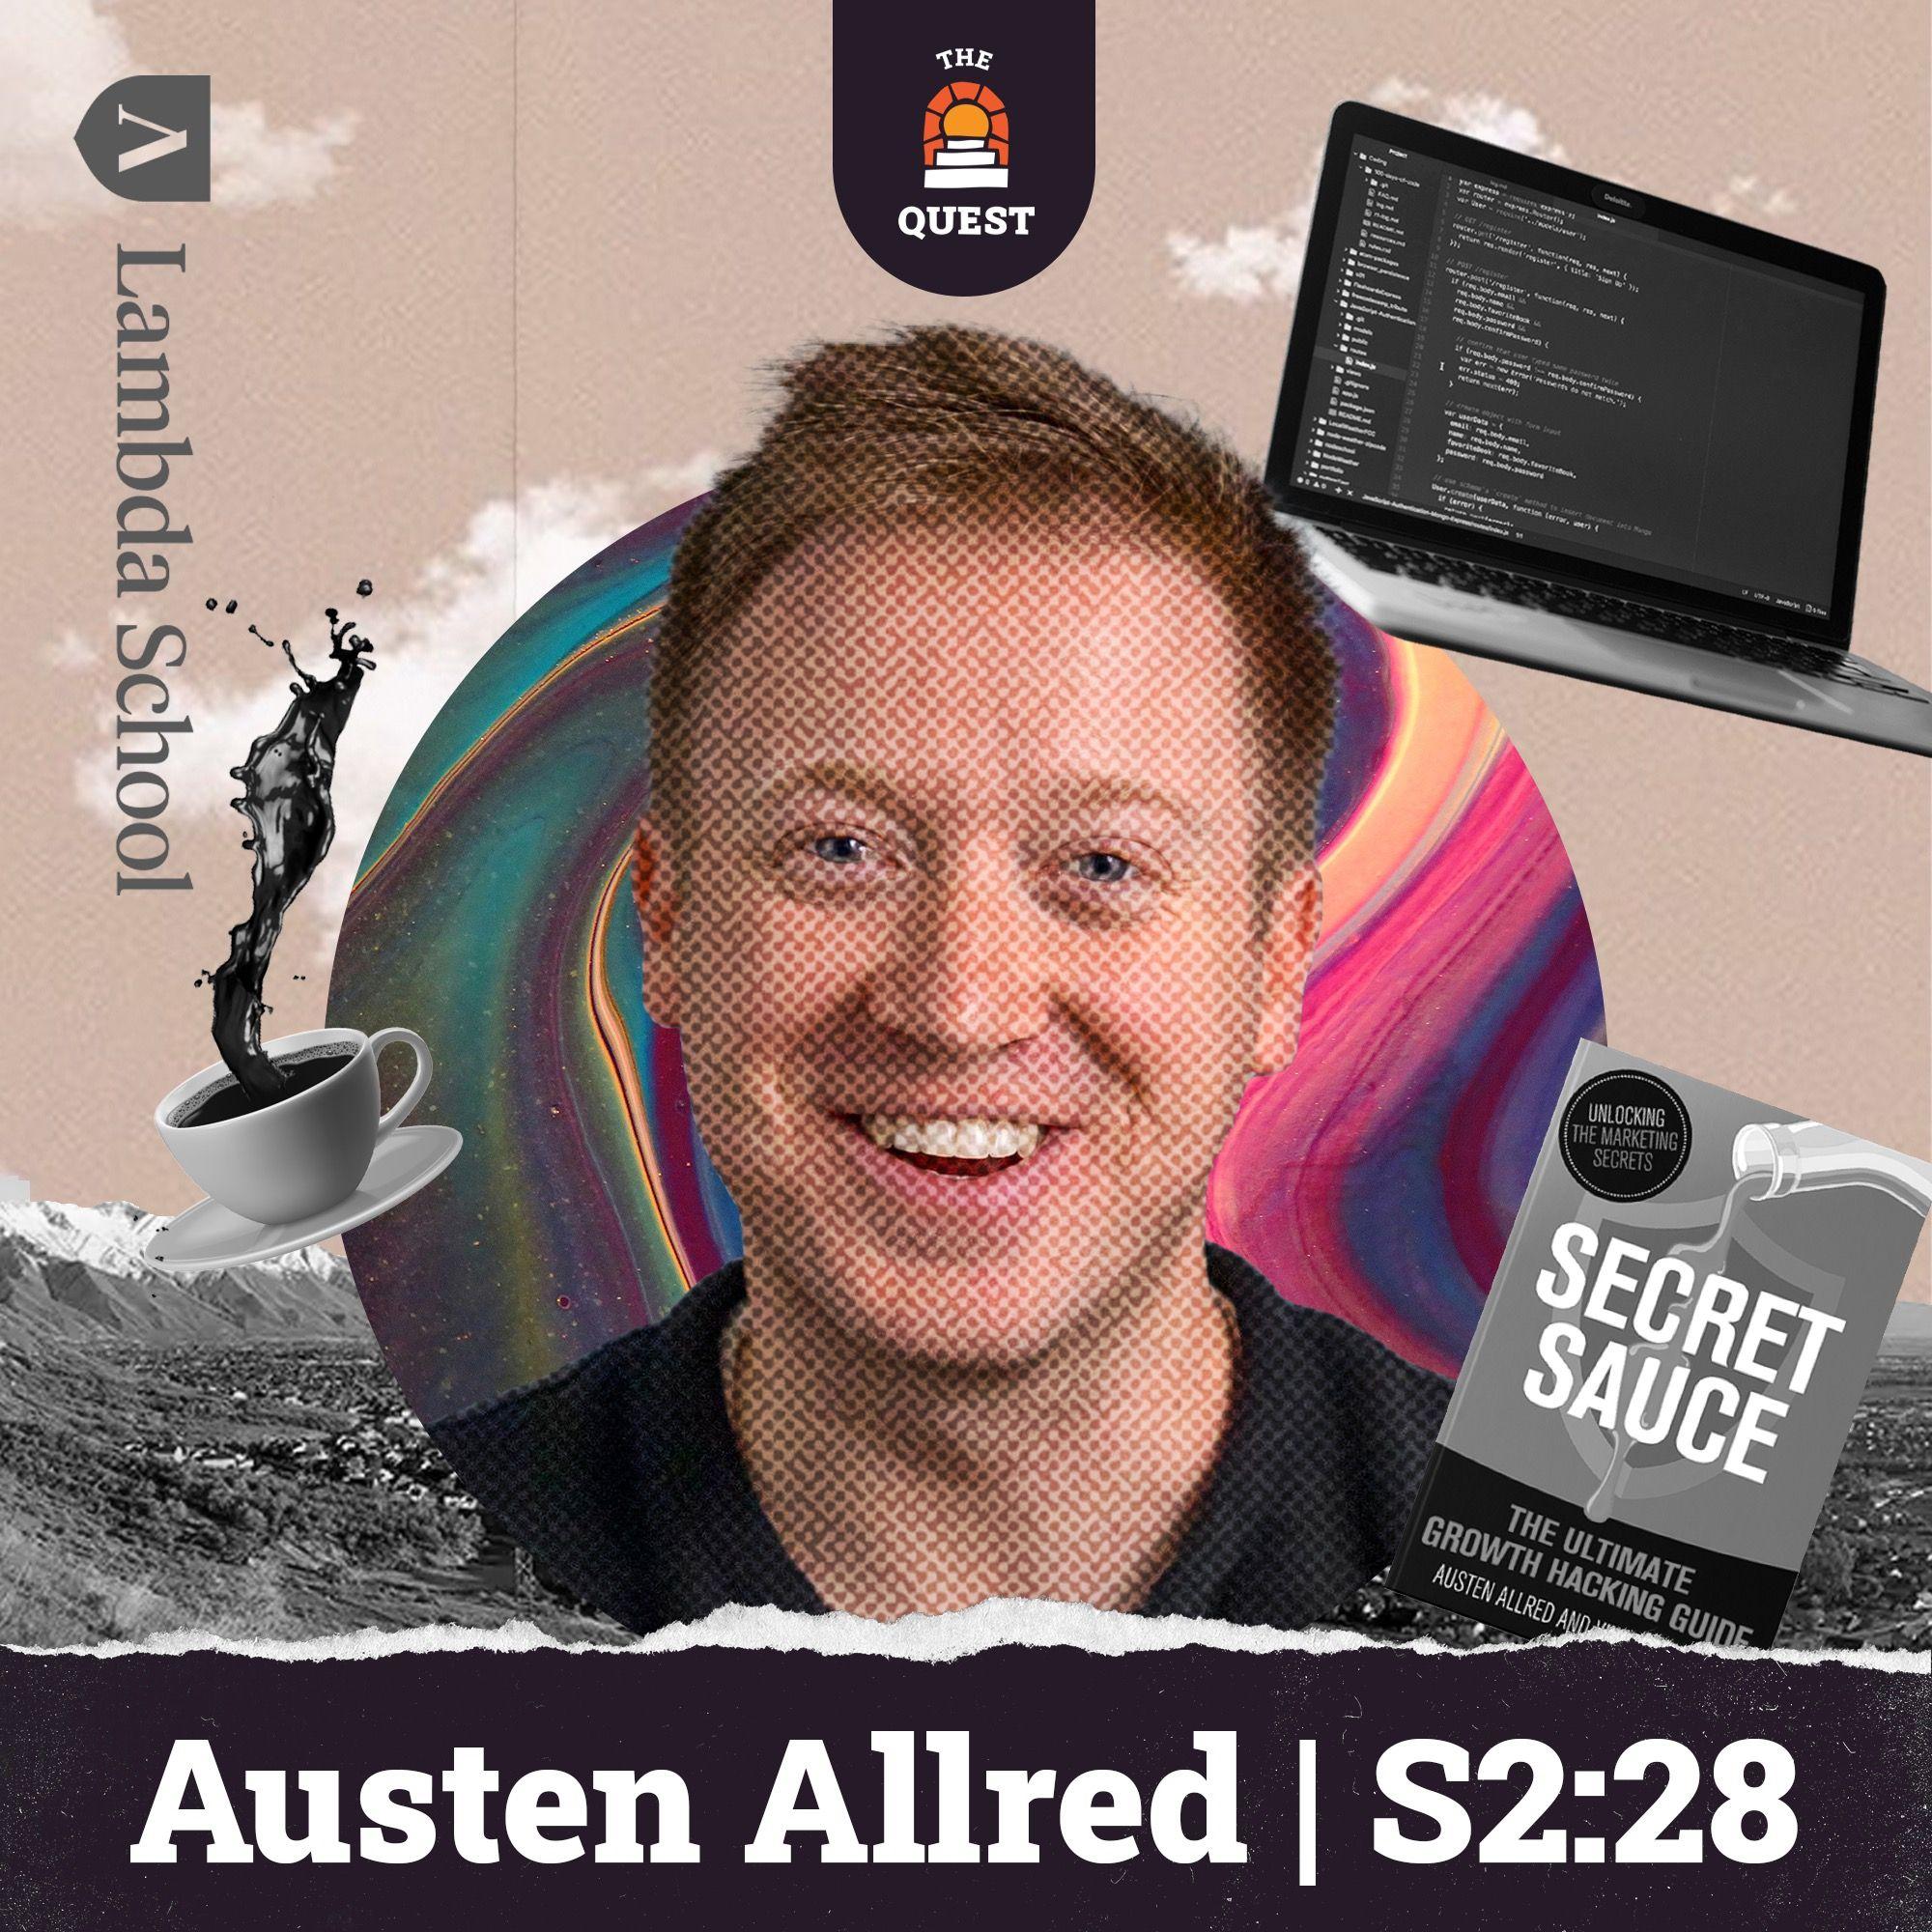 Austen Allred: Lambda School, Y-Combinator, Free Education, Programming and Code